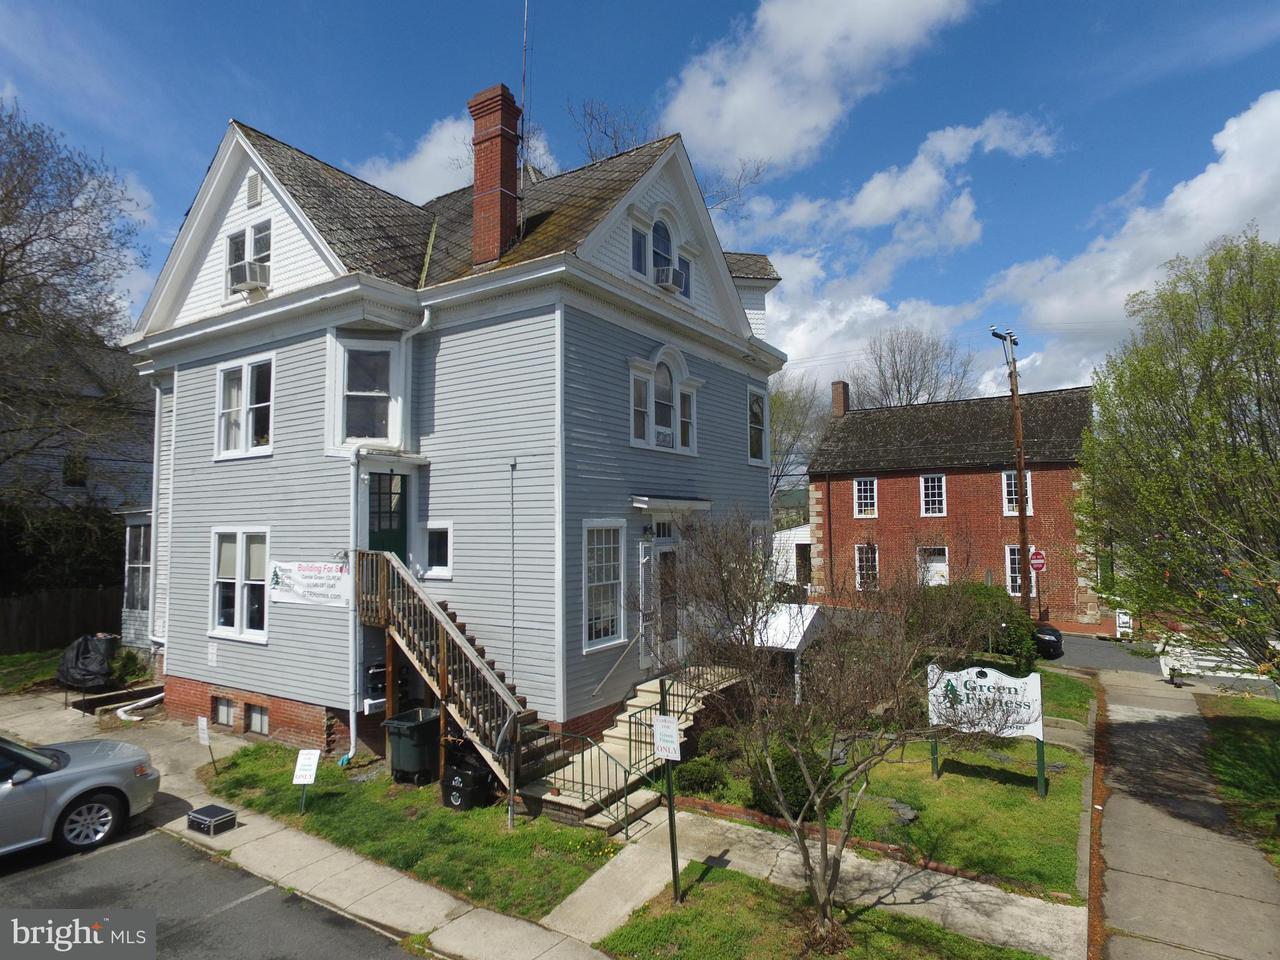 Commercial for Sale at 1122 CAROLINE Street 1122 CAROLINE Street Fredericksburg, Virginia 22401 United States